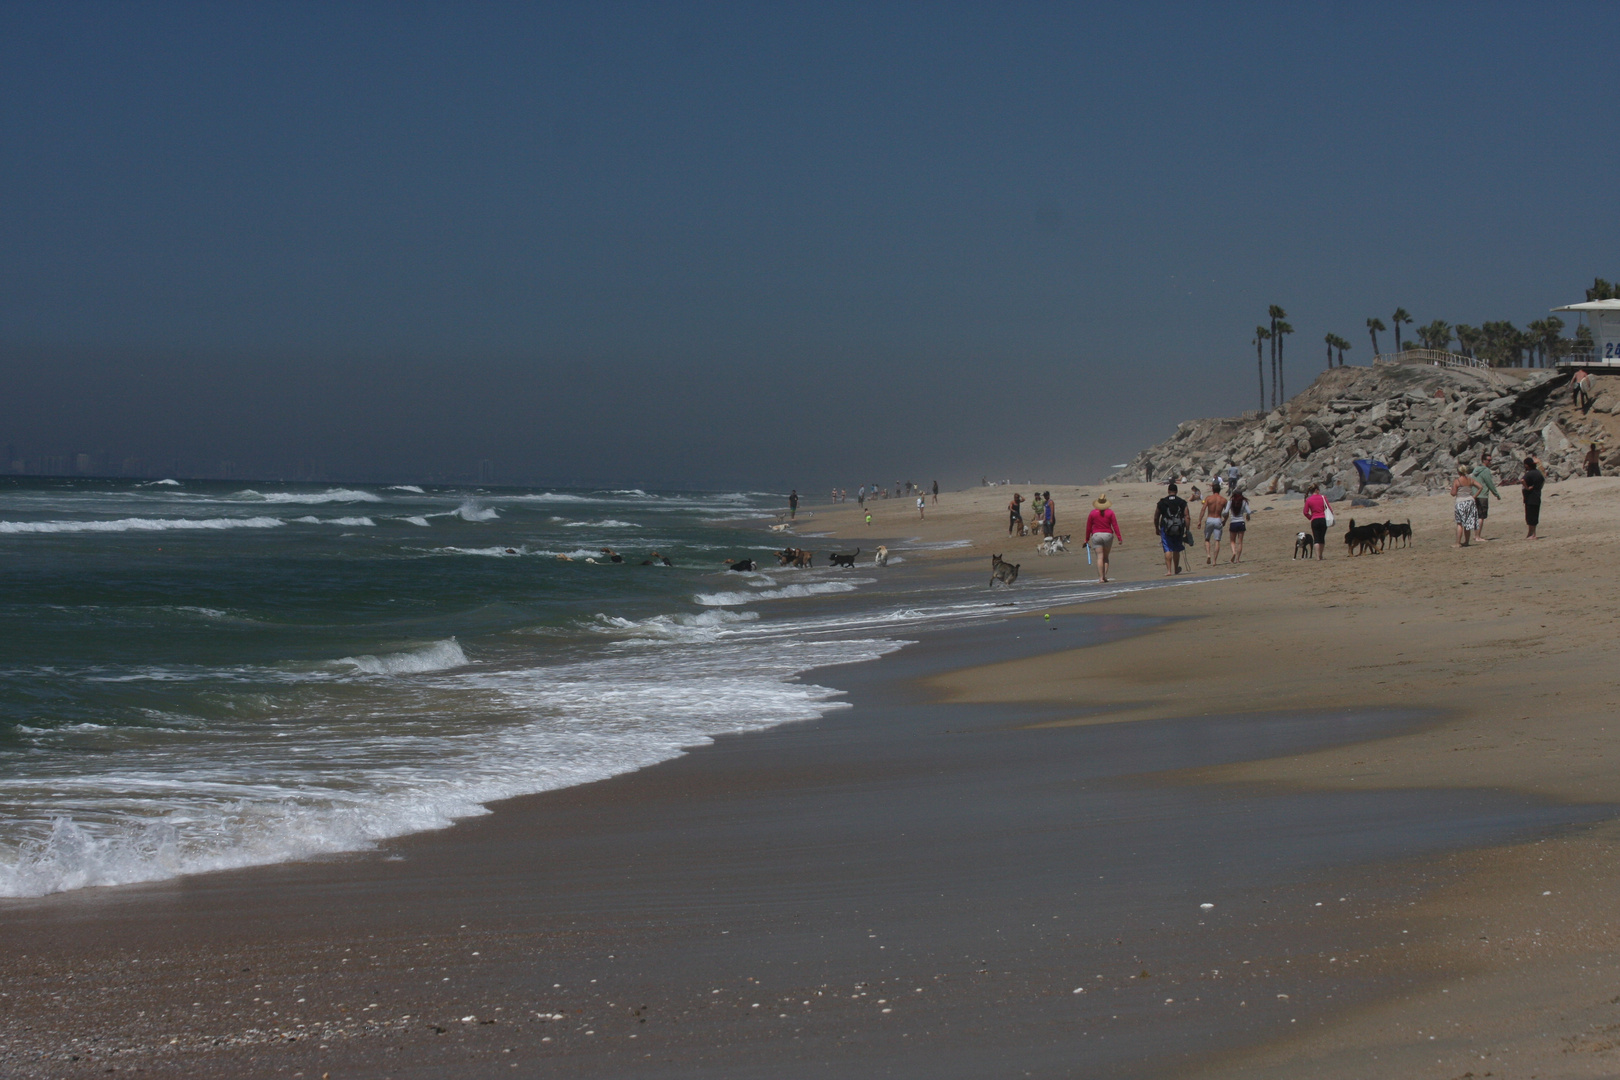 Leben am Strand